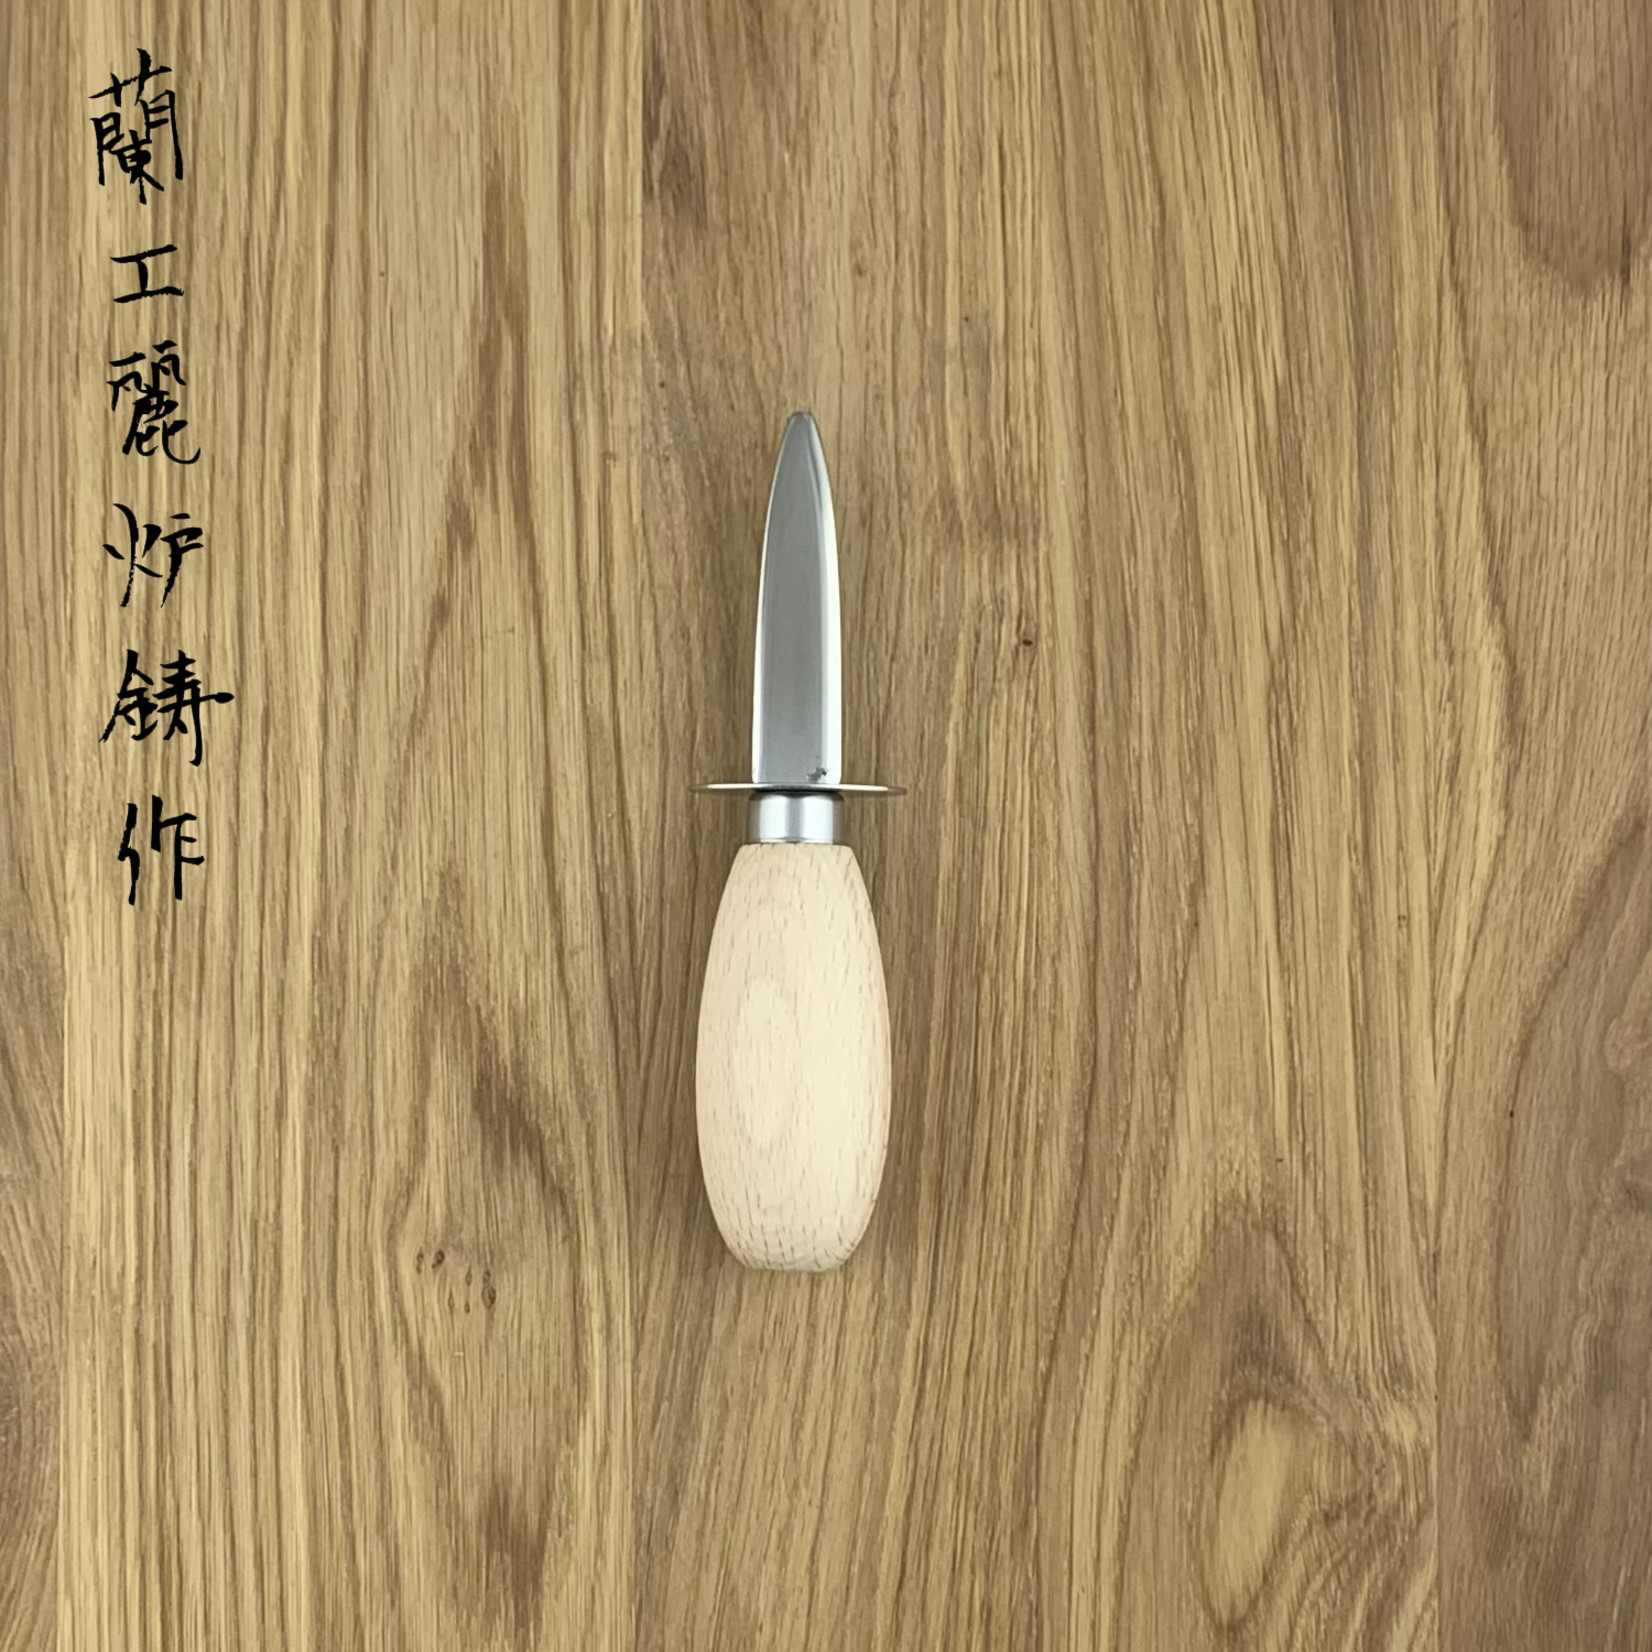 SAKAI TAKAYUKI Oyster knife Round wood 09242